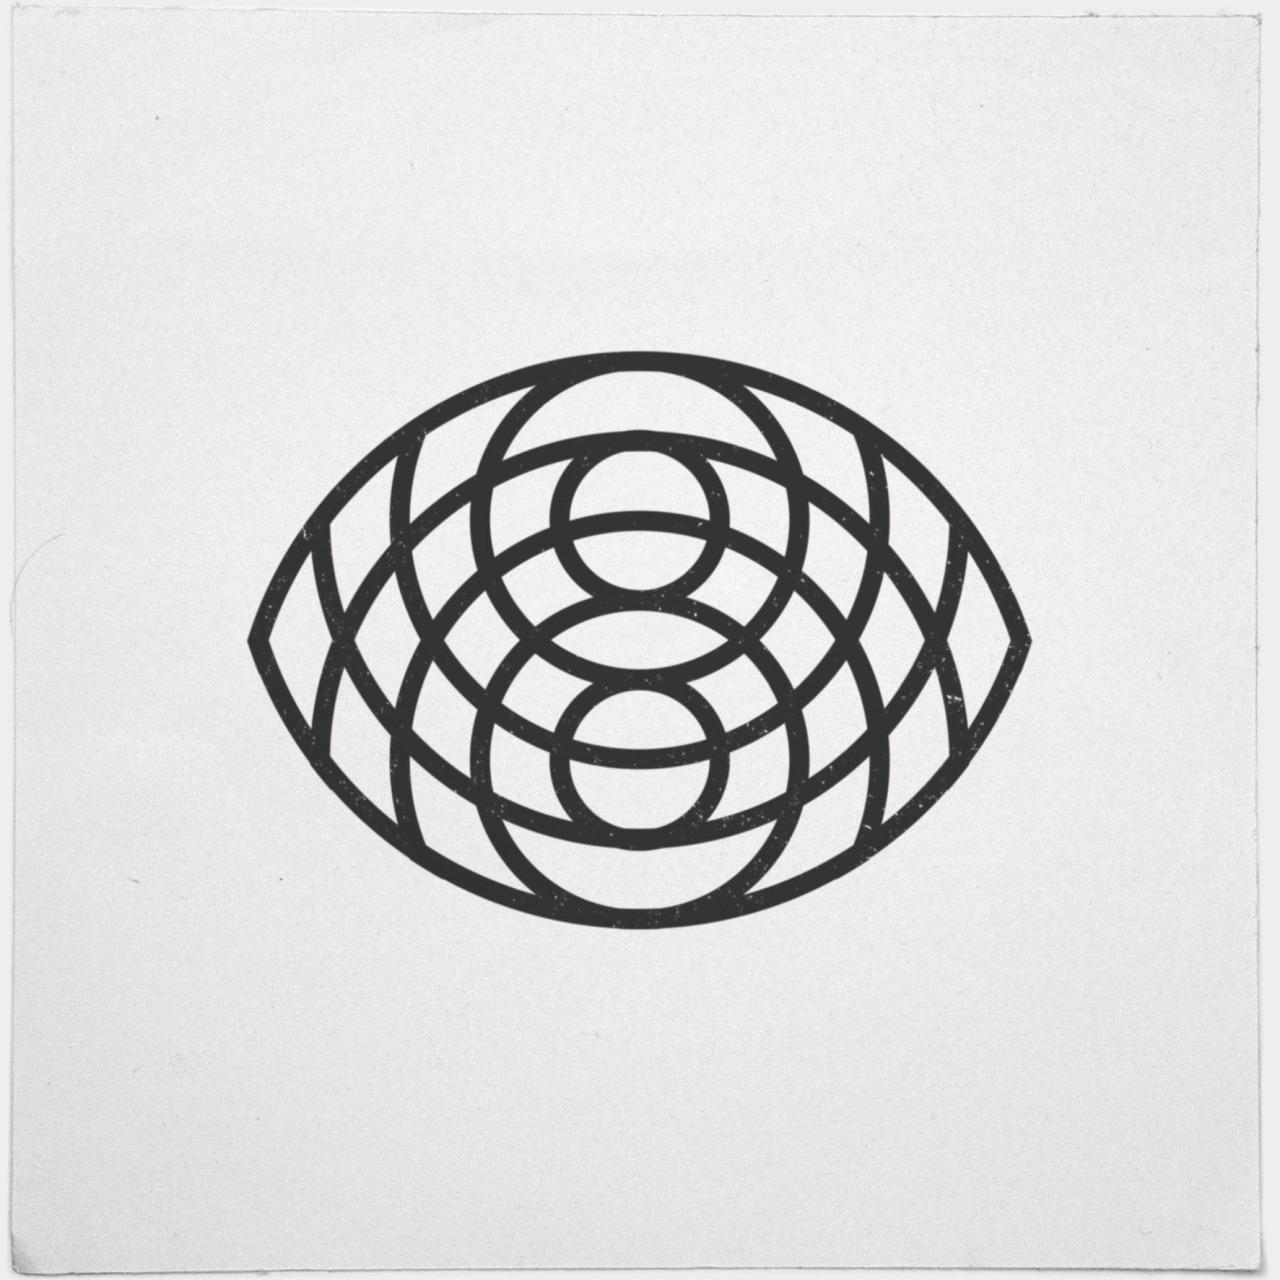 geometrydaily: #462 Smaug